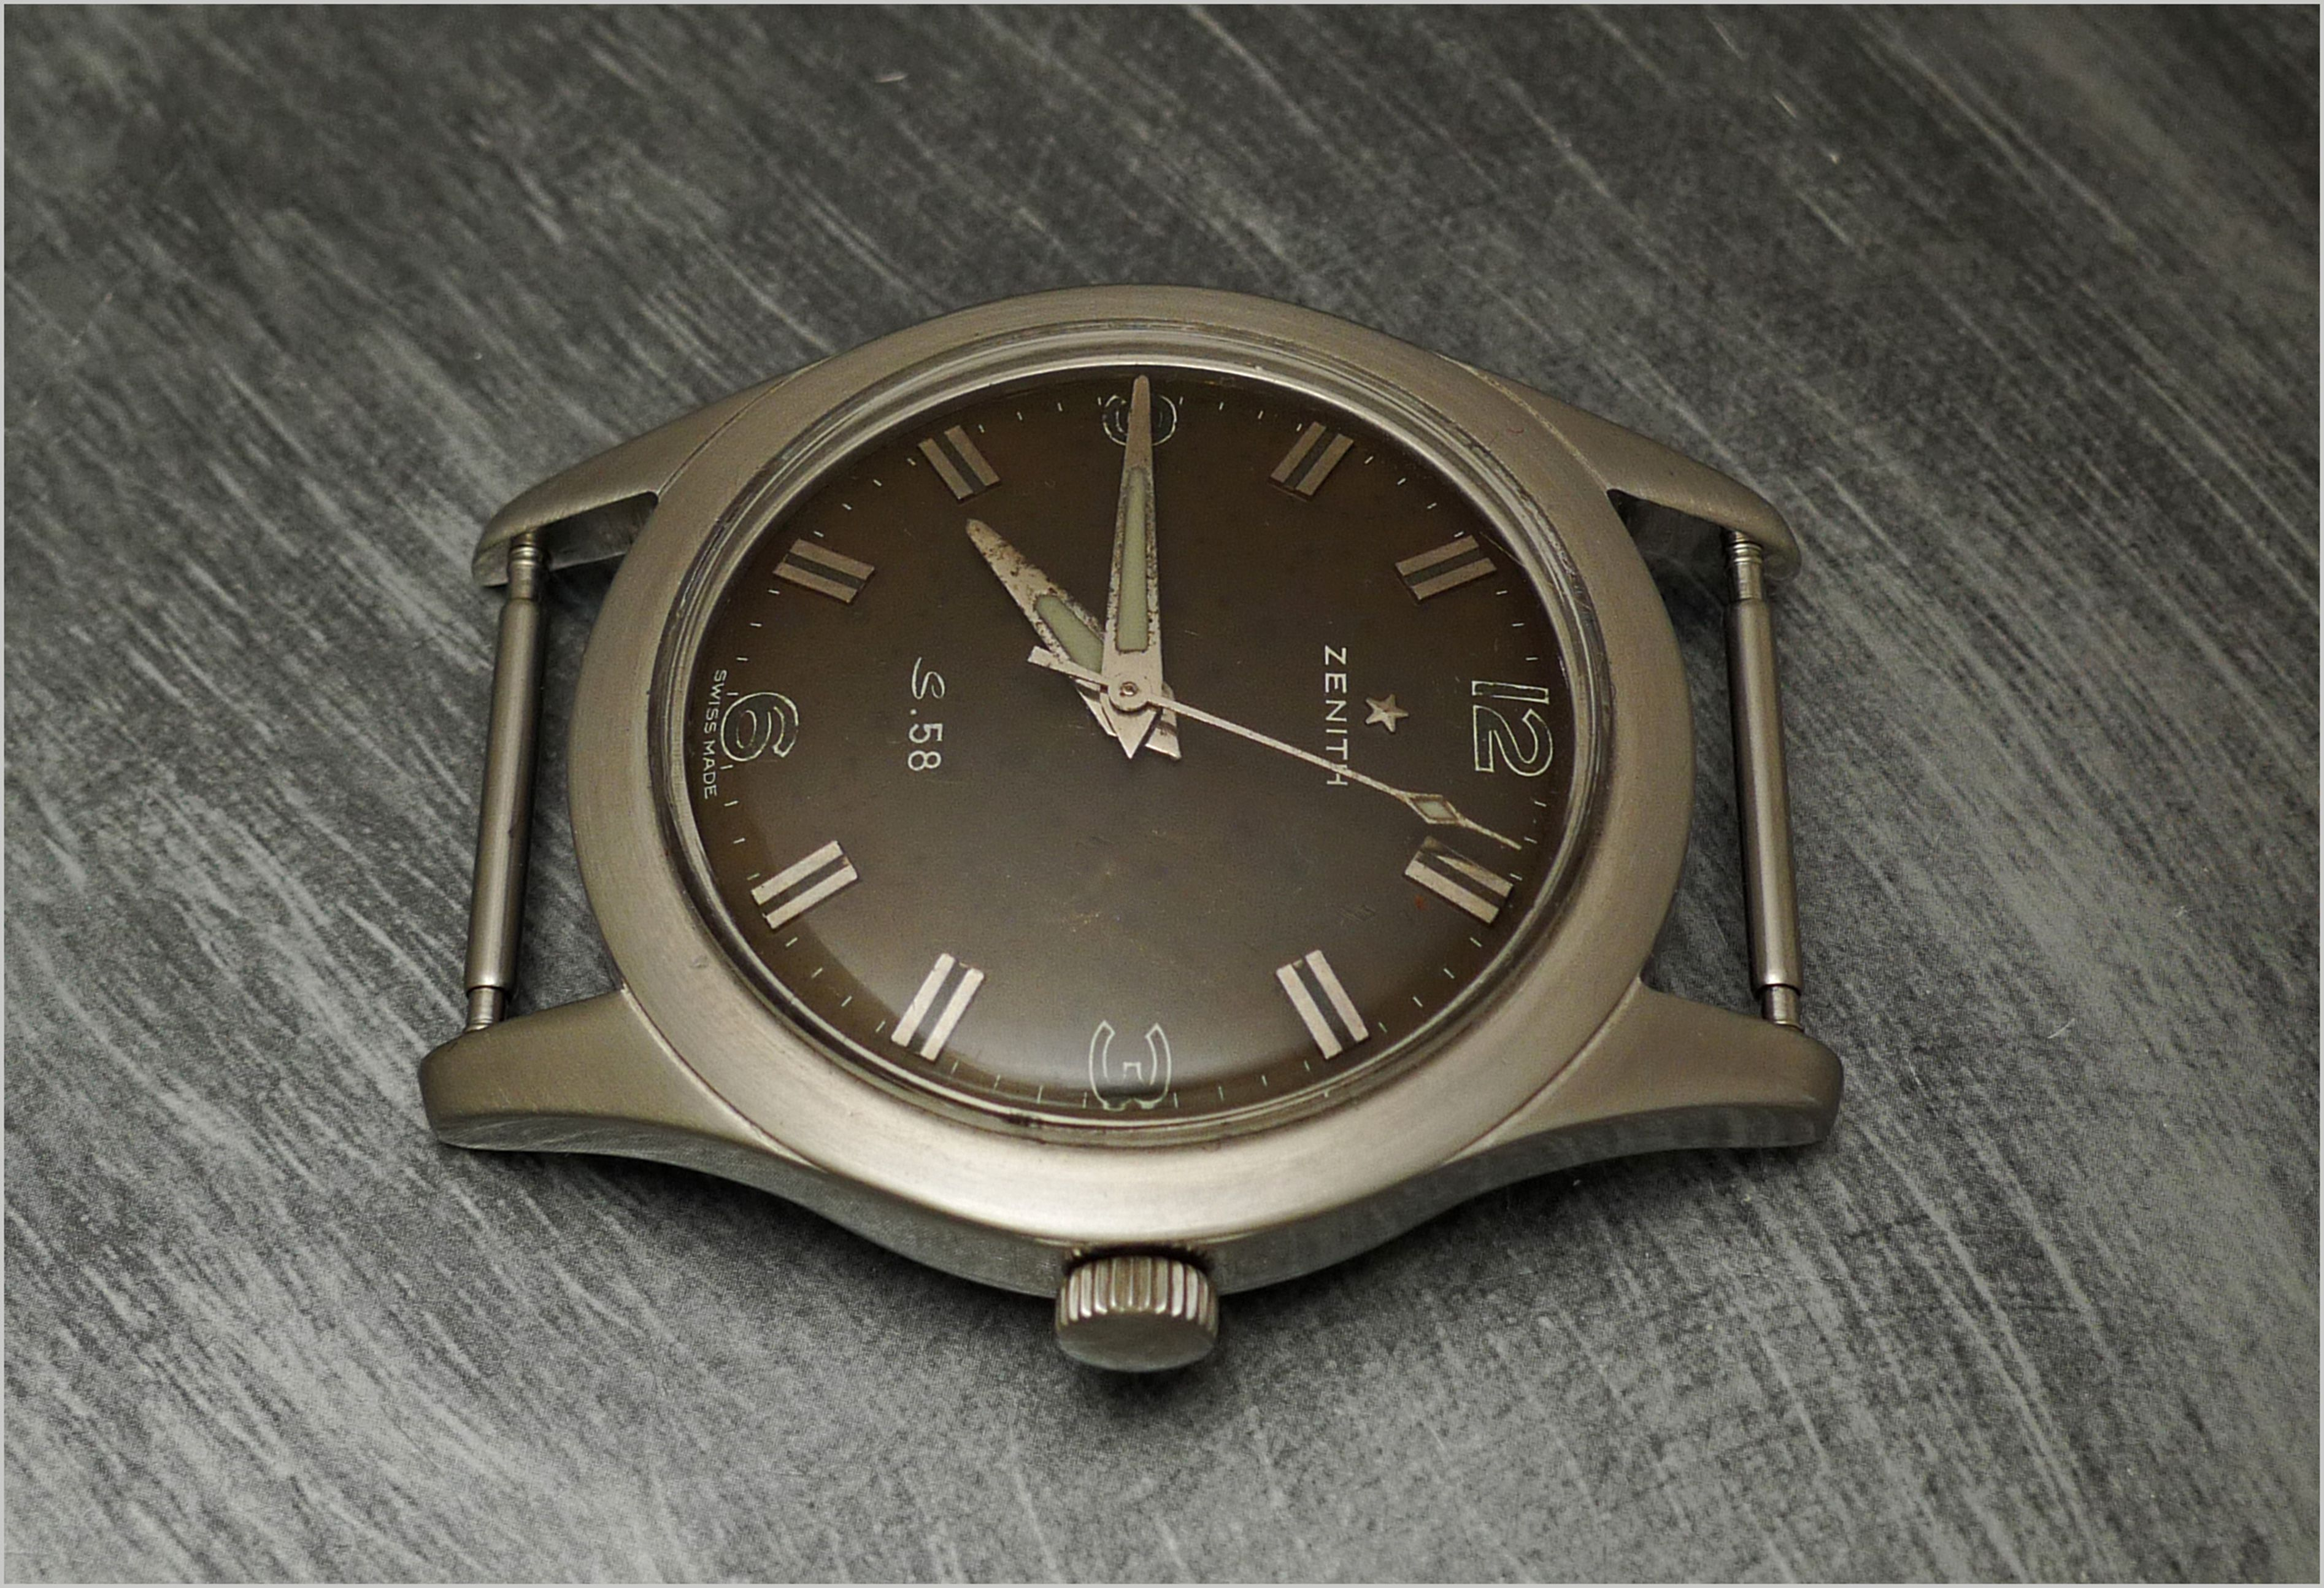 Reloj Zenith S 58